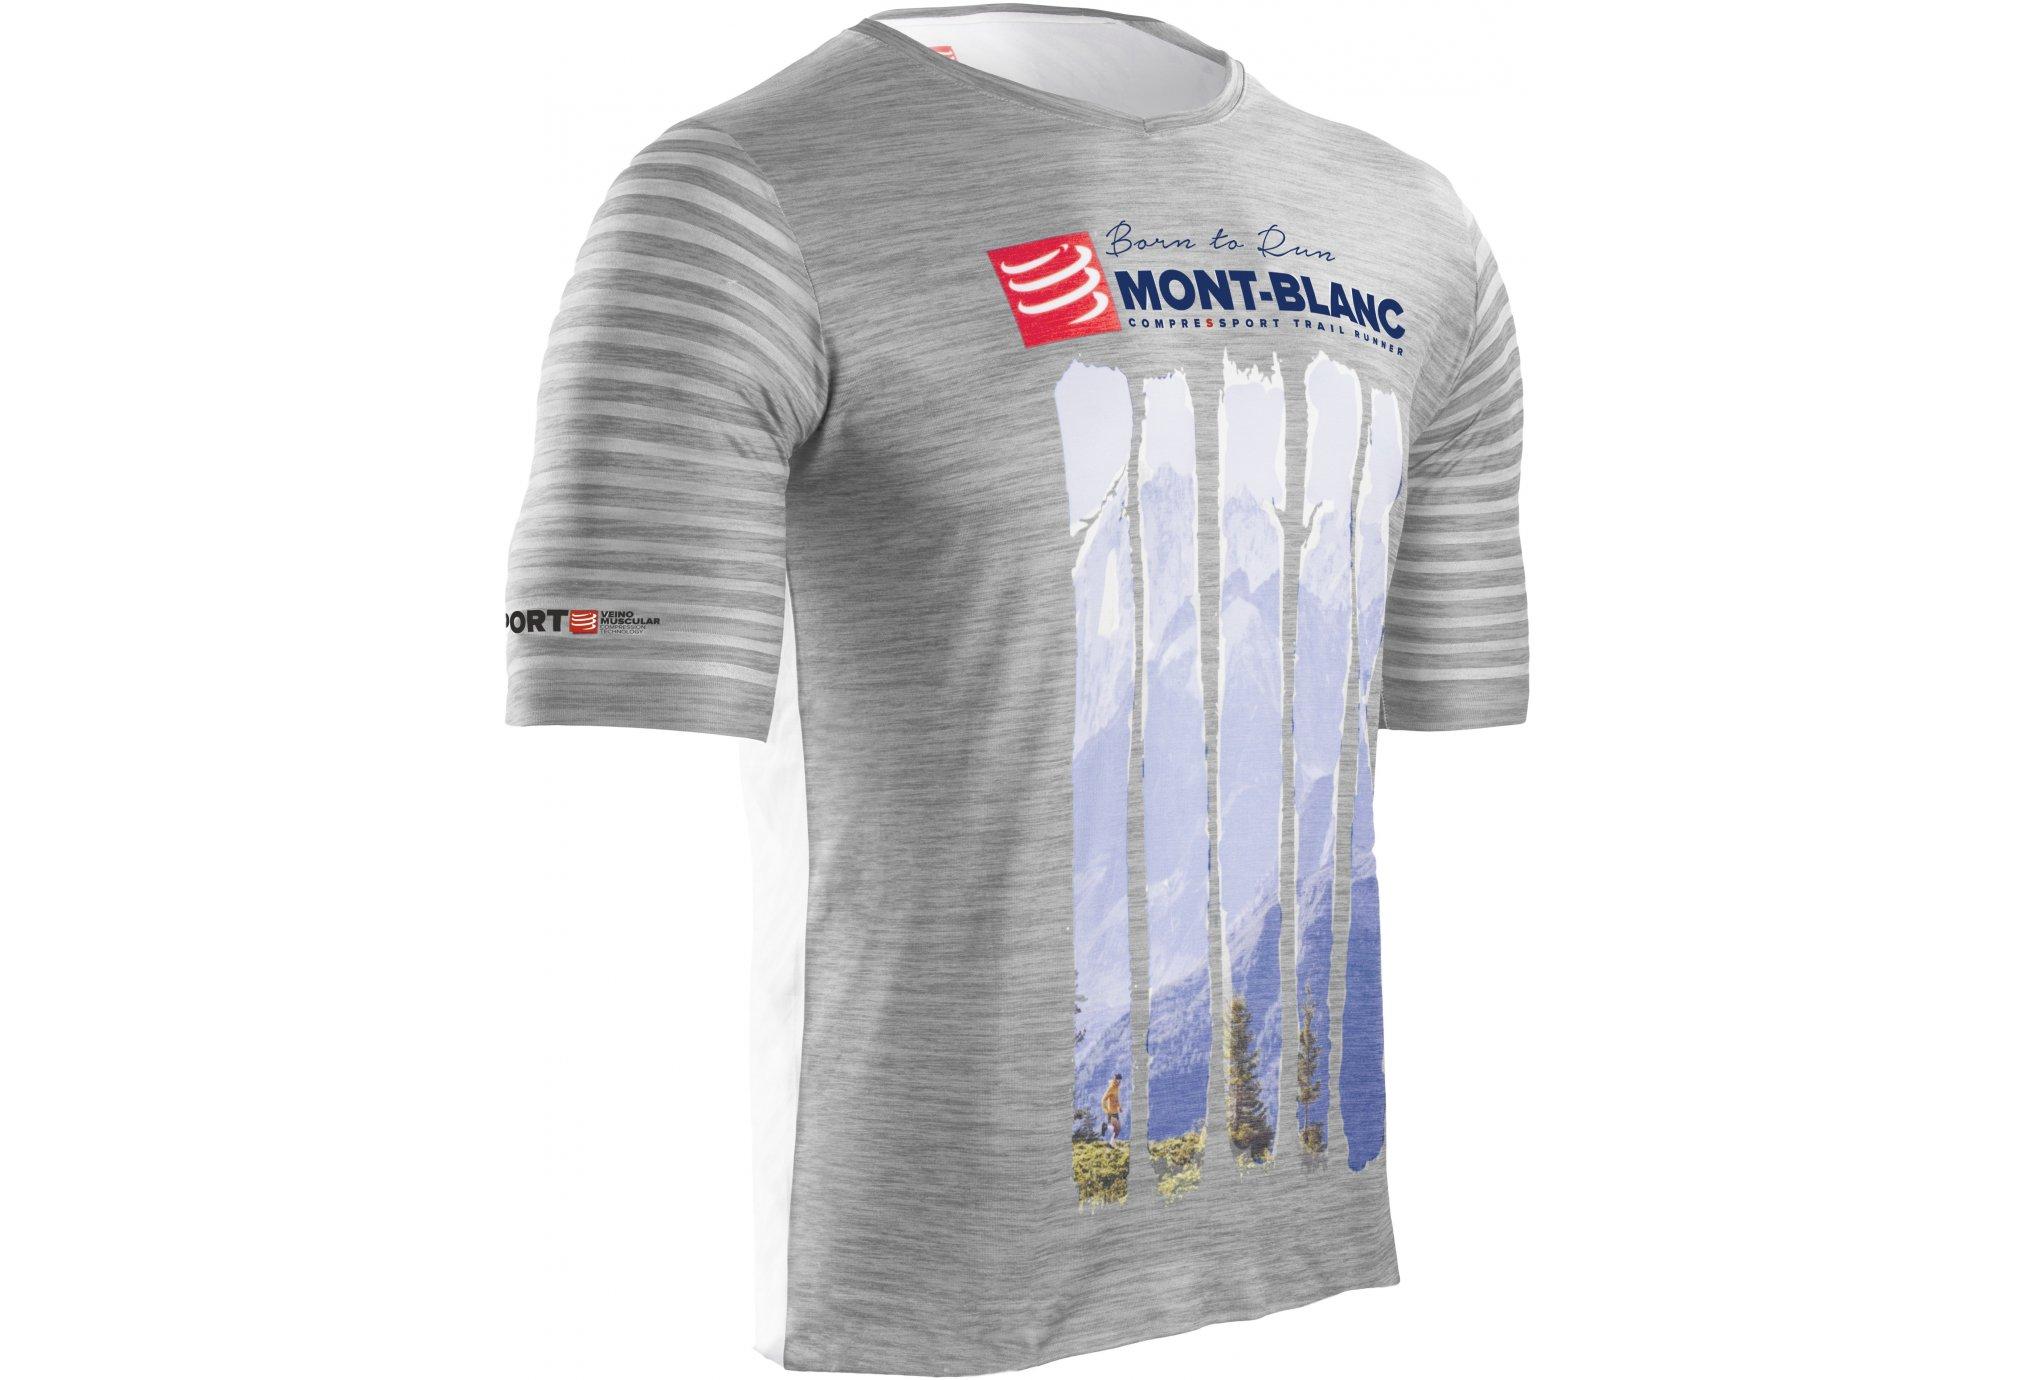 Compressport Training Tshirt Mont Blanc 2017 M vêtement running homme f0cb067c2d9